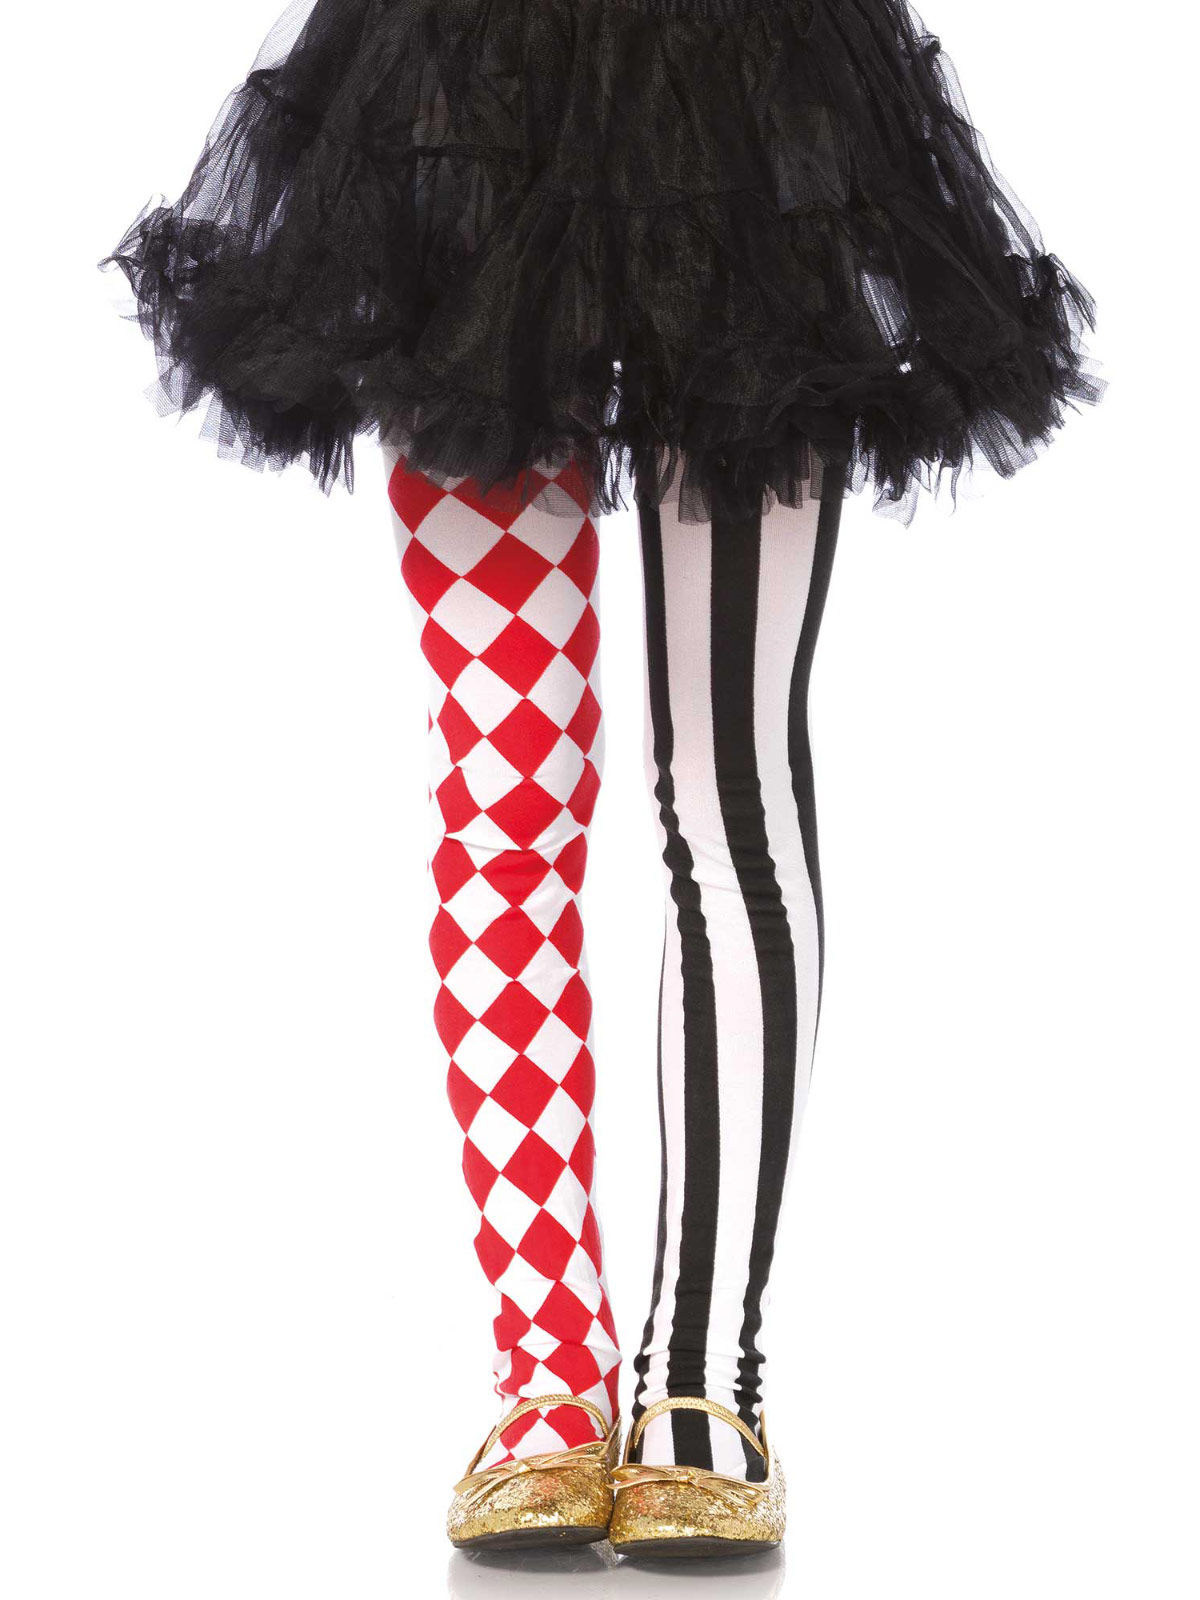 harlekin strumpfhose f r kinder clown schwarz rot weiss g nstige faschings accessoires. Black Bedroom Furniture Sets. Home Design Ideas